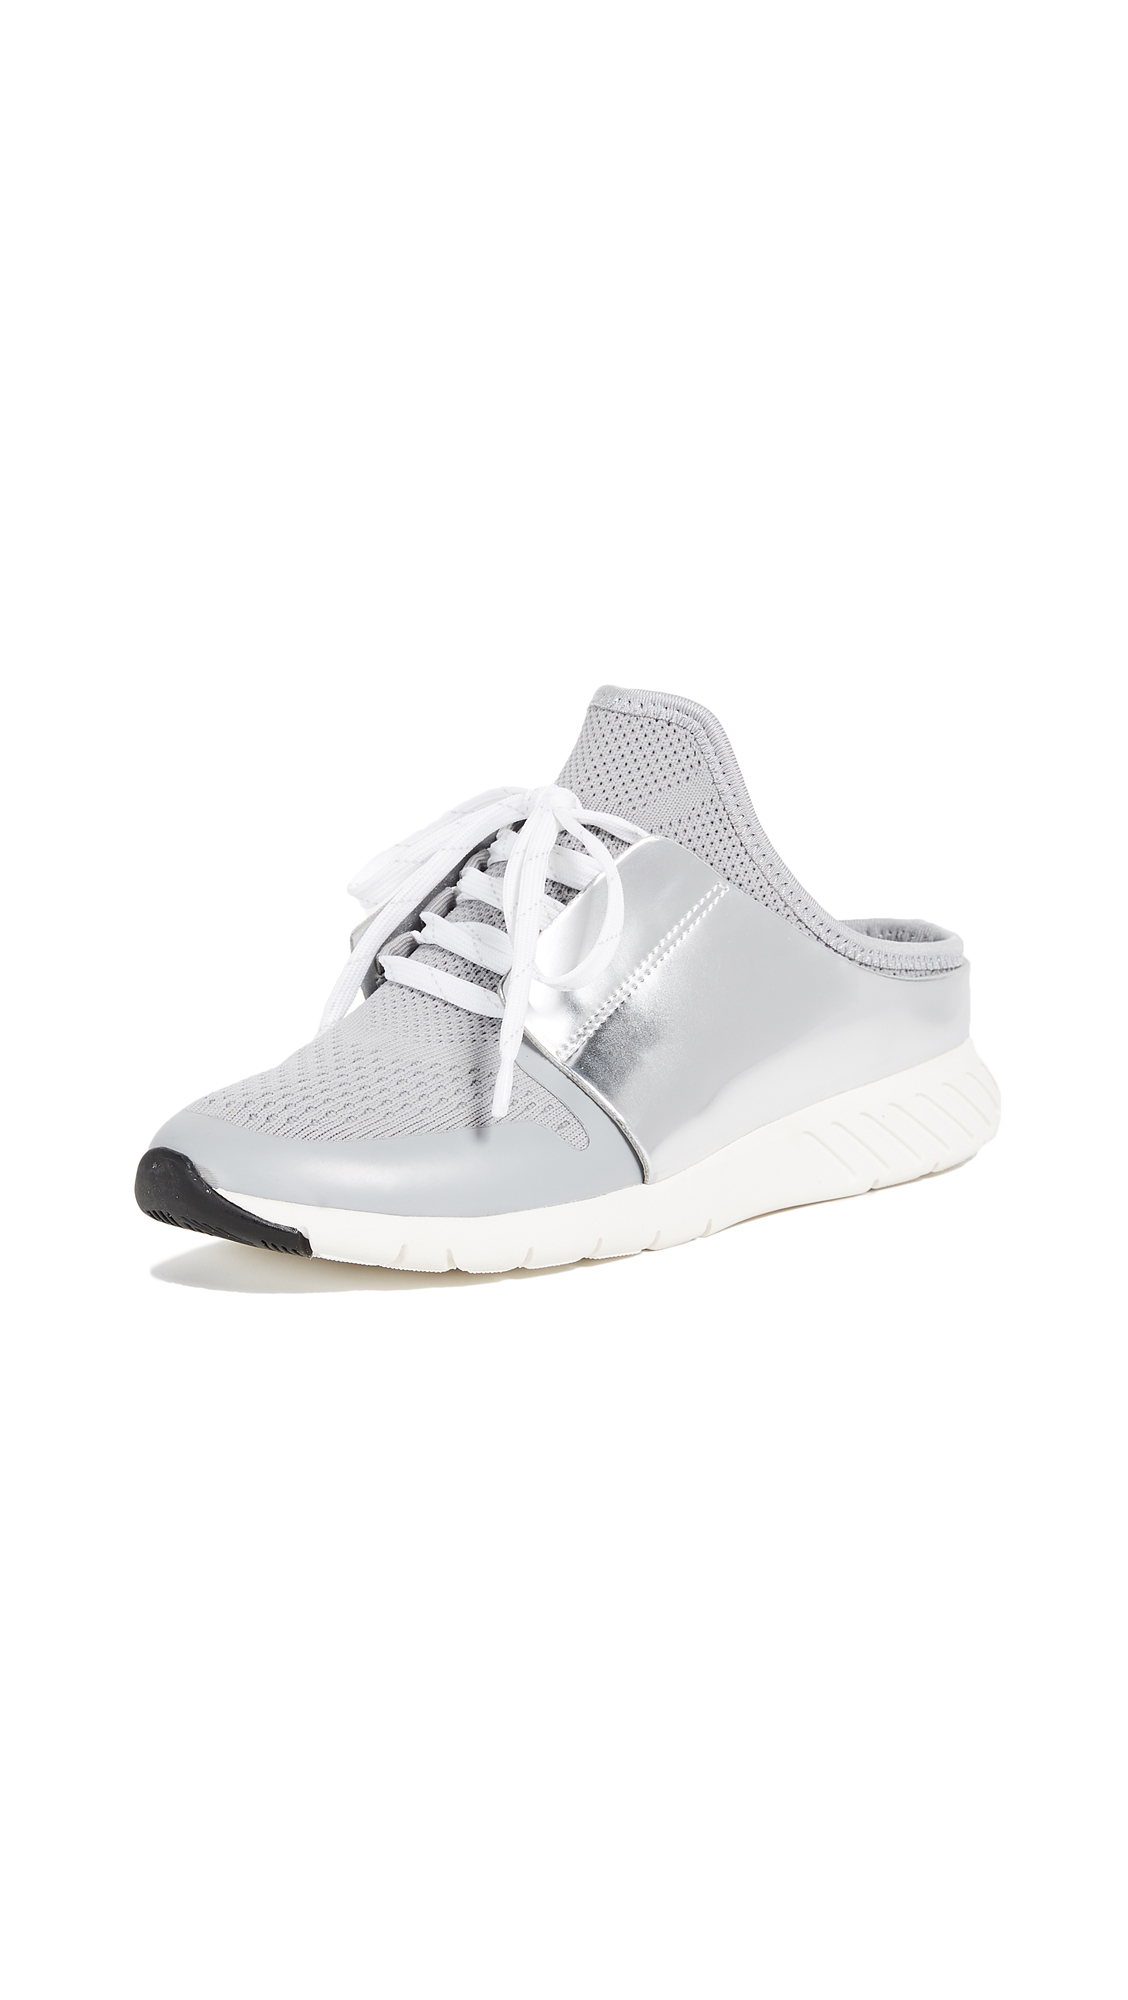 Dolce Vita Braun Mule Sneakers - Silver